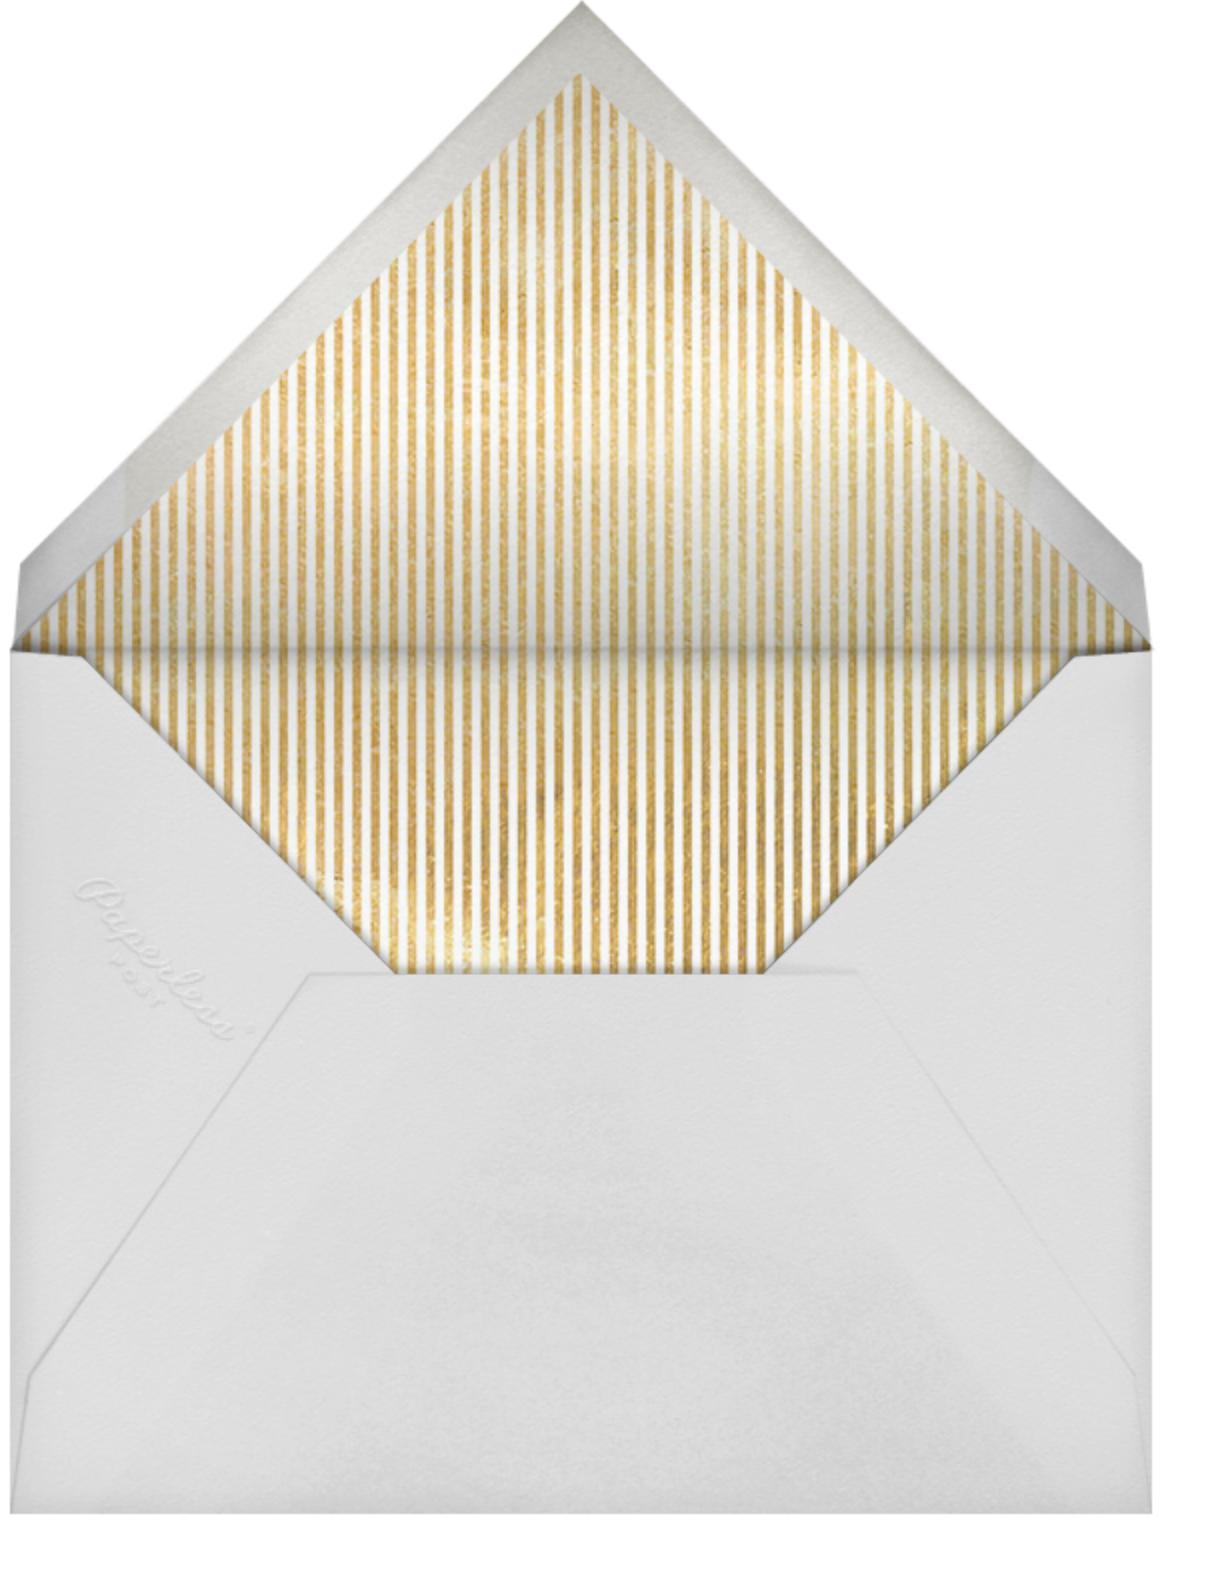 Milestone Dots (Sixty) - Navy - Sugar Paper - Adult birthday - envelope back